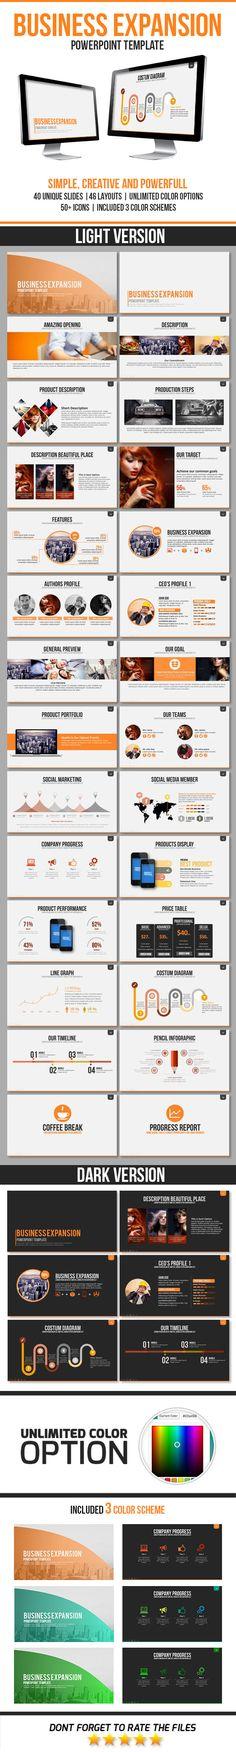 Zero Business Presentation PowerPoint Template #powerpoint - business presentation